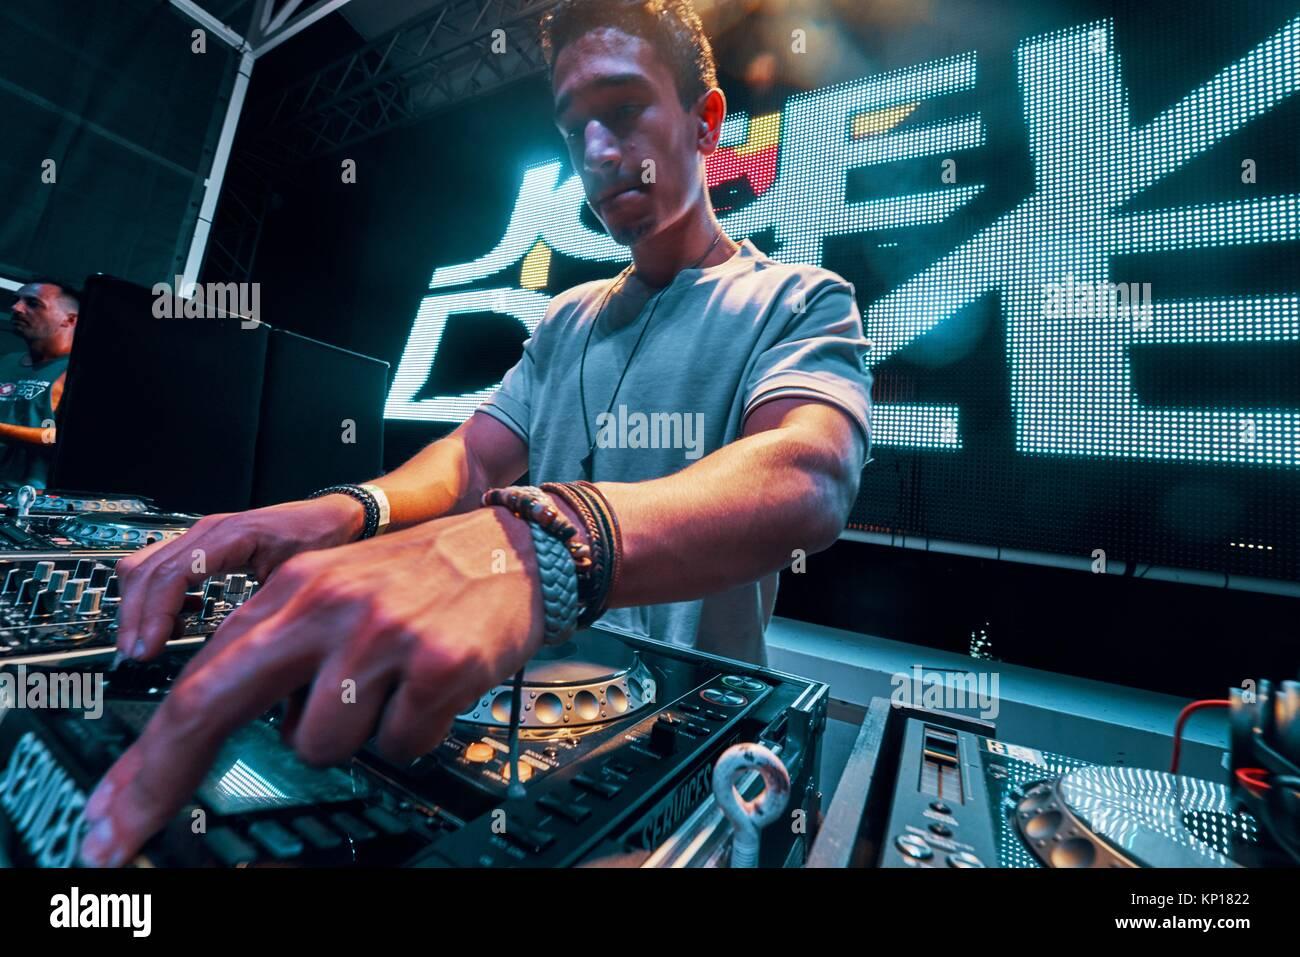 DJ-Joey Dale an Musik Festival Starbeach in Hersonissos, Kreta, Griechenland, am 25. August 2017 Stockbild